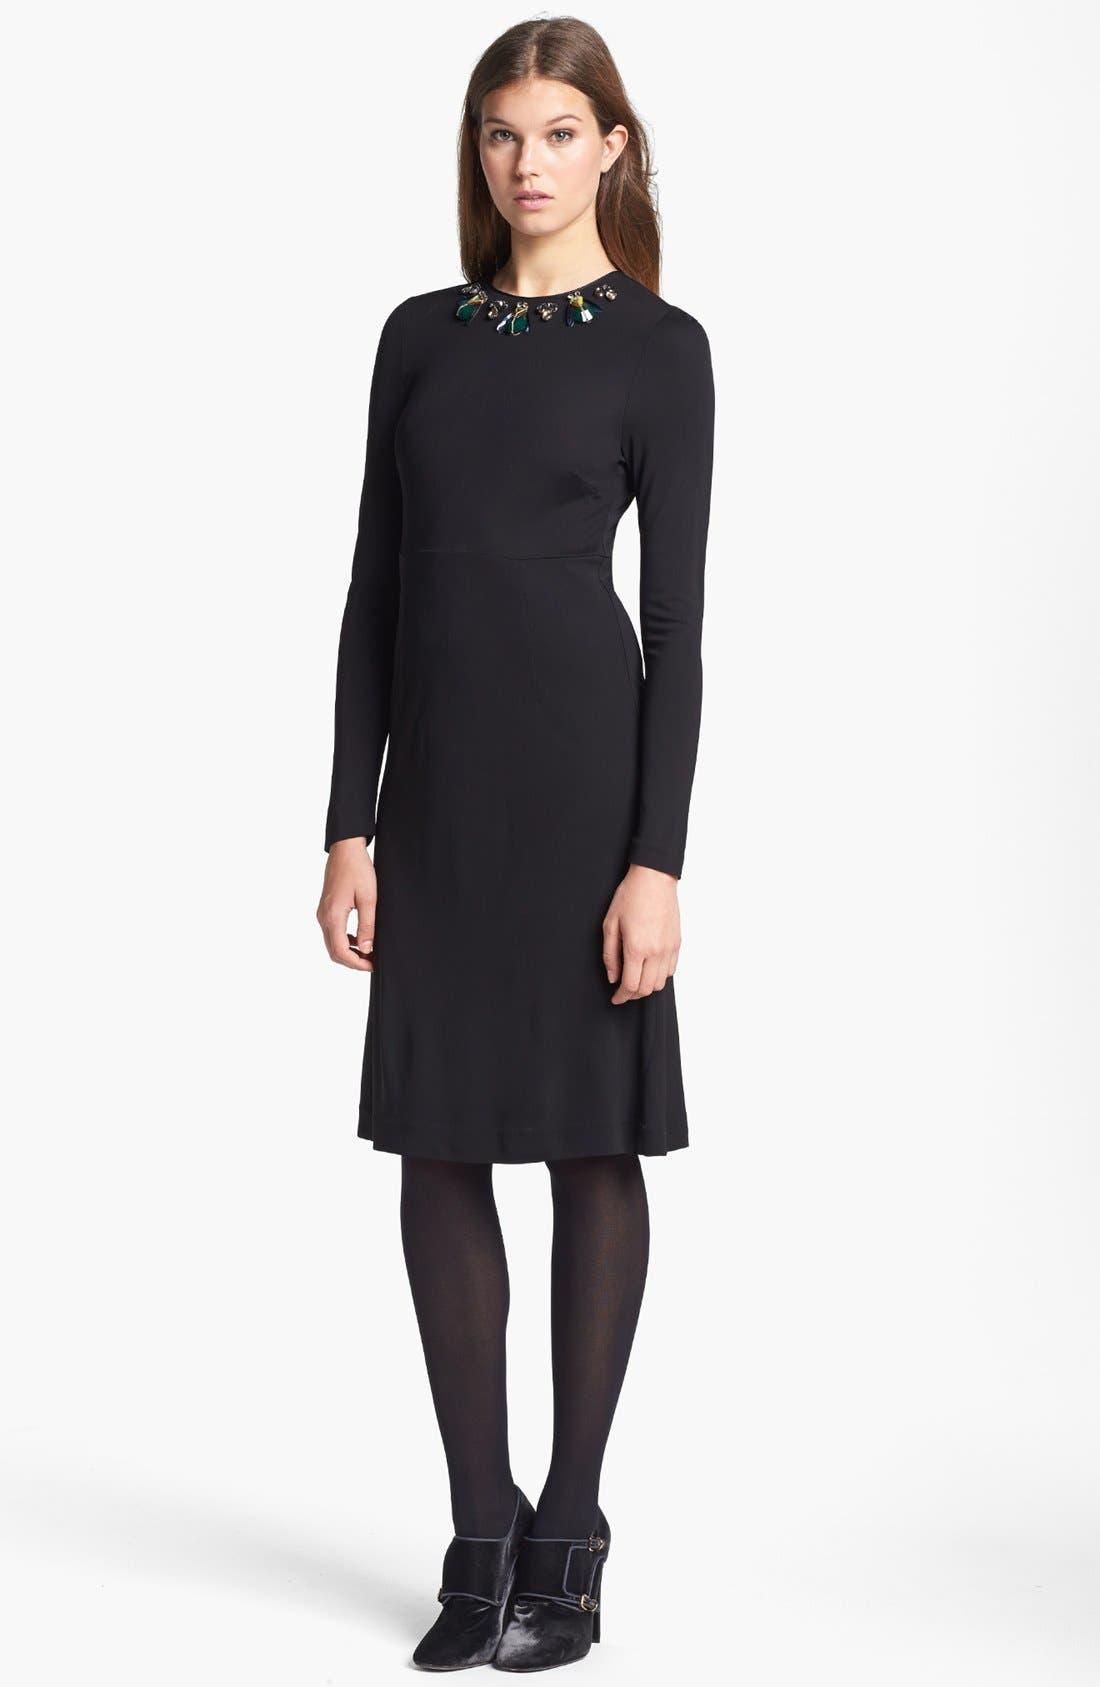 Alternate Image 1 Selected - Tory Burch 'Deena' Embellished A-Line Dress